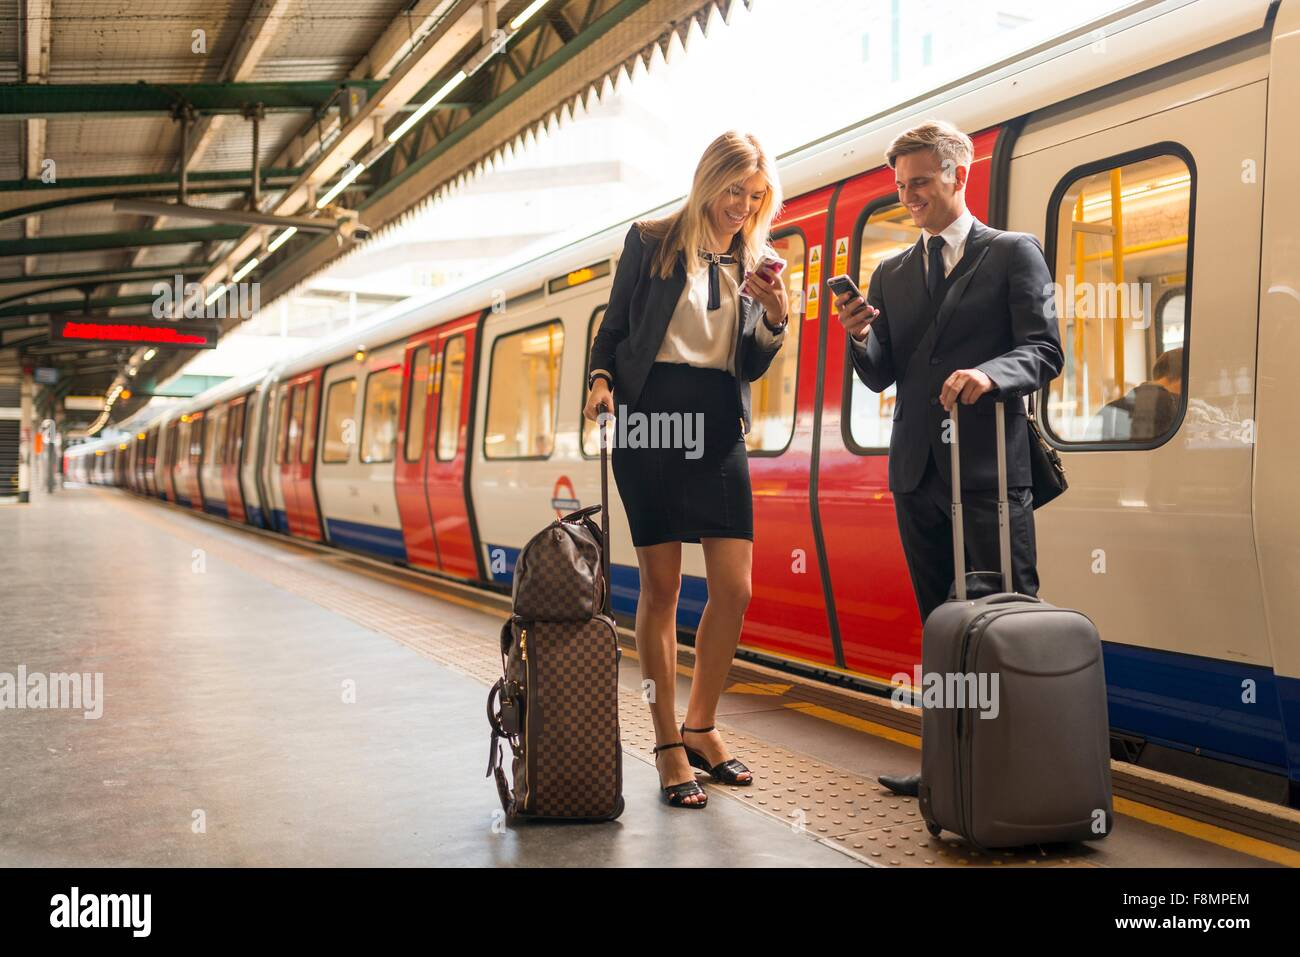 Businessman and businesswoman texting on platform, Underground station, London, UK - Stock Image